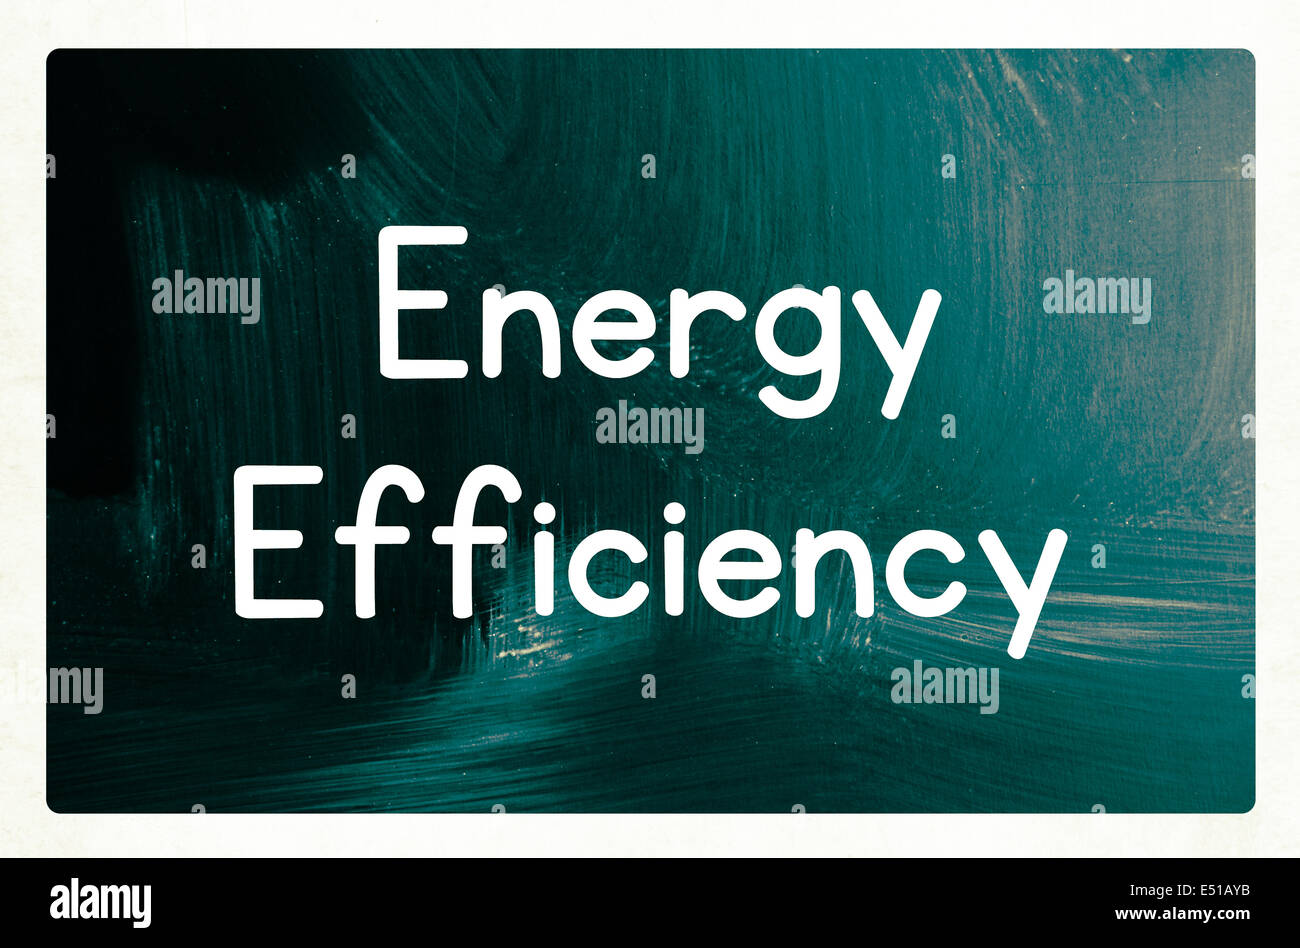 energy efficiency concept - Stock Image